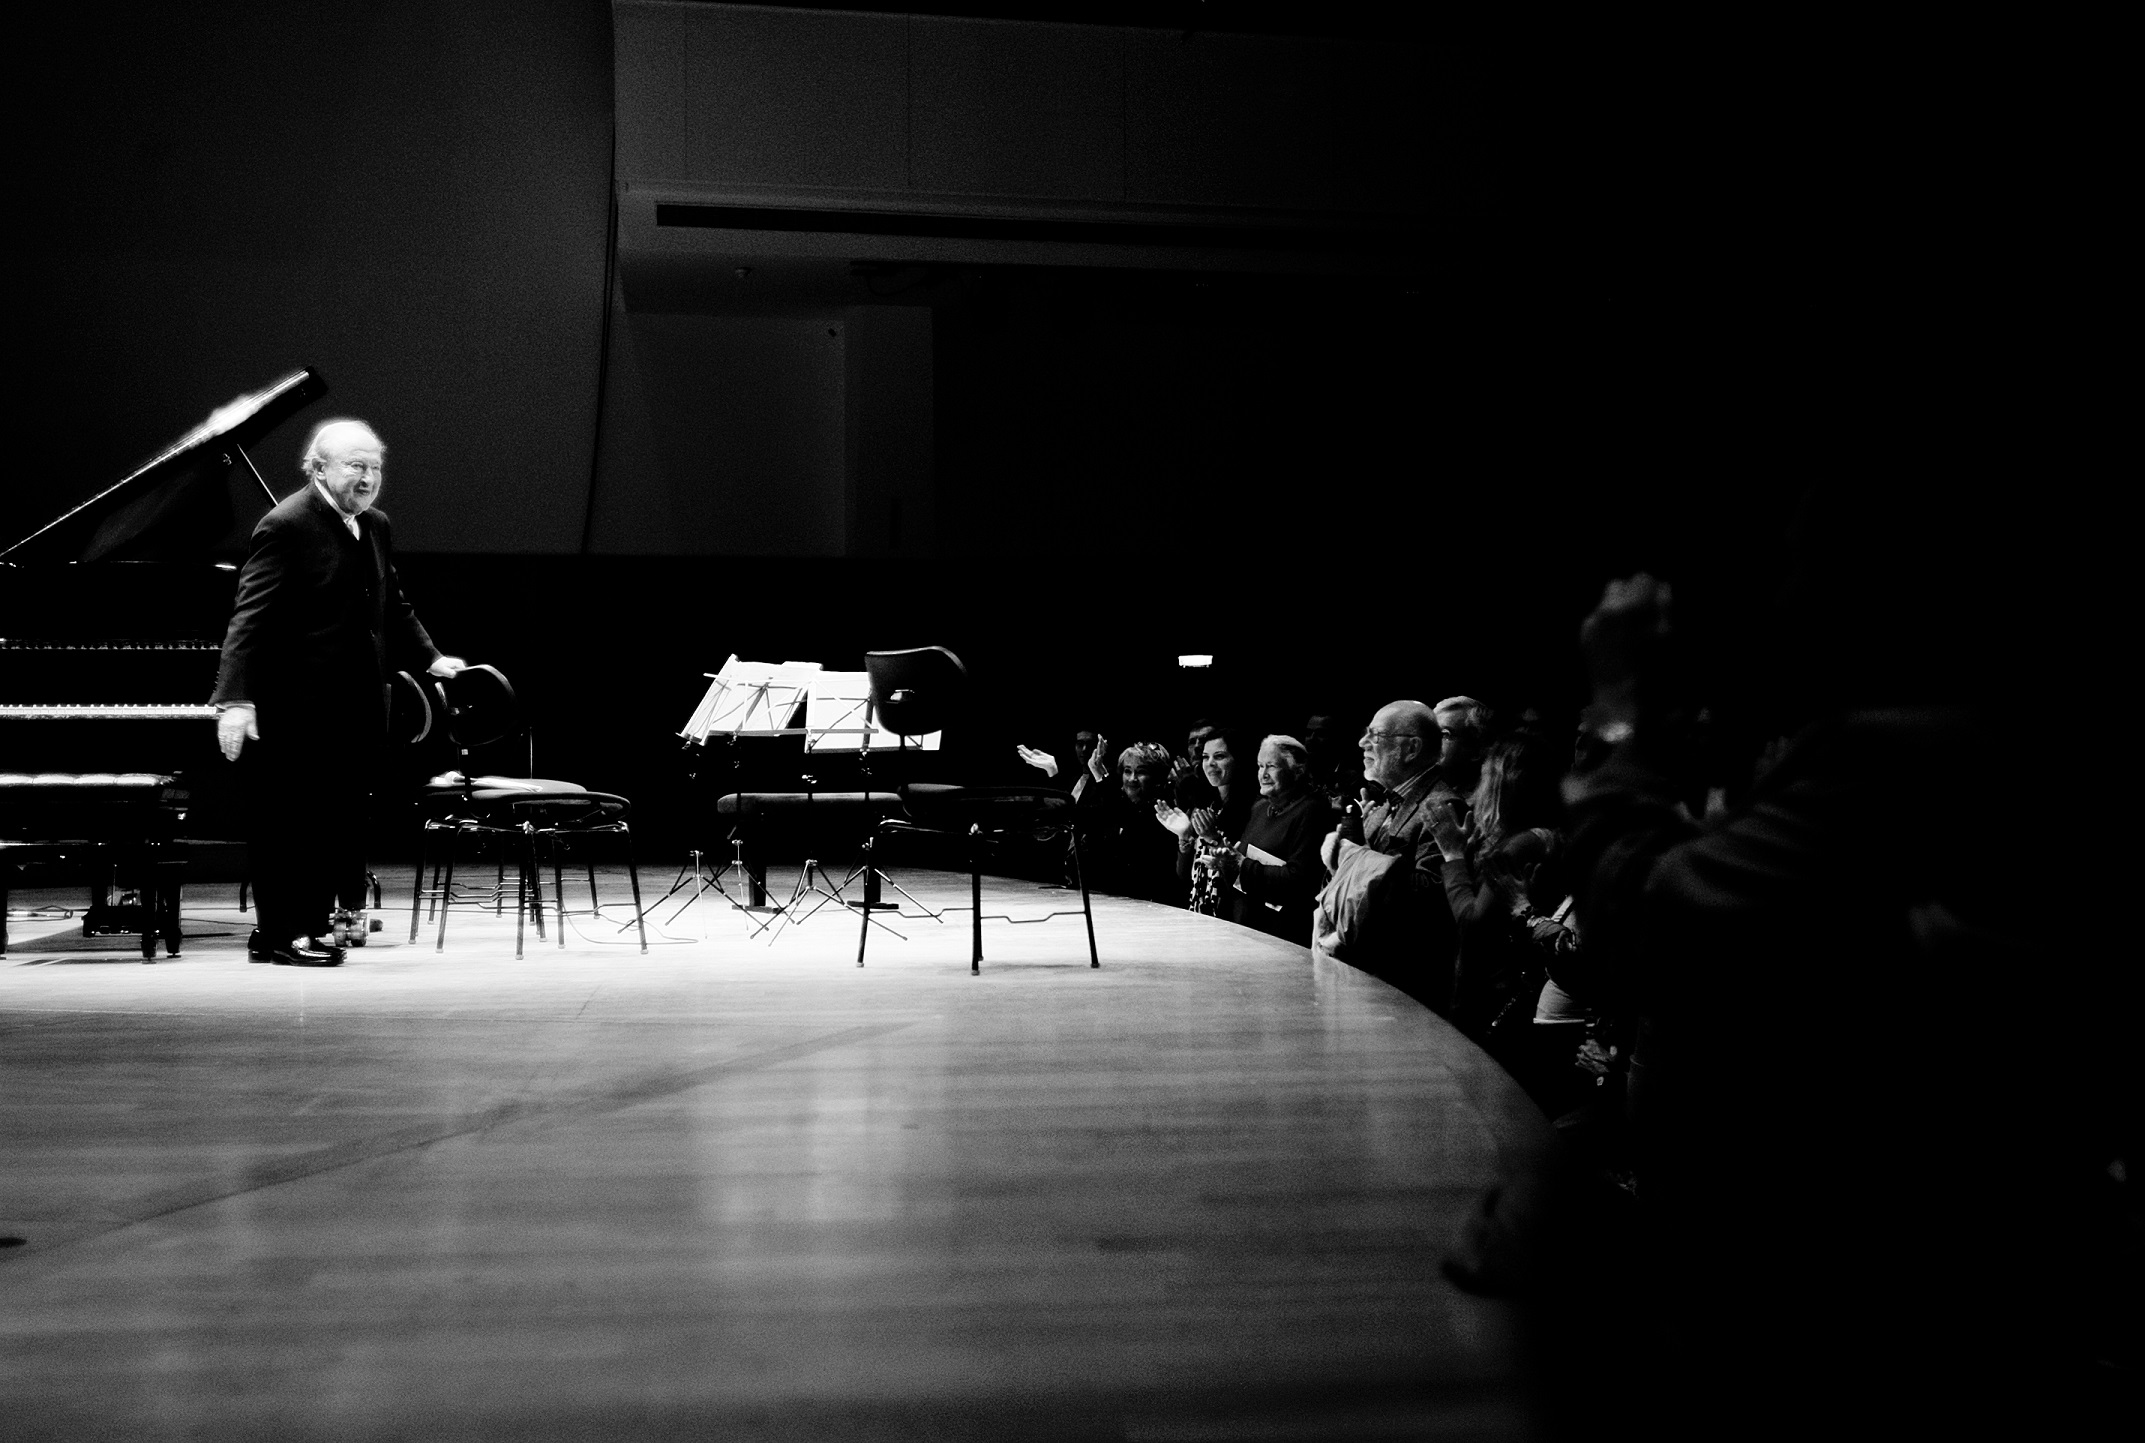 Menahem Pressler performs at his 90th birthday concert